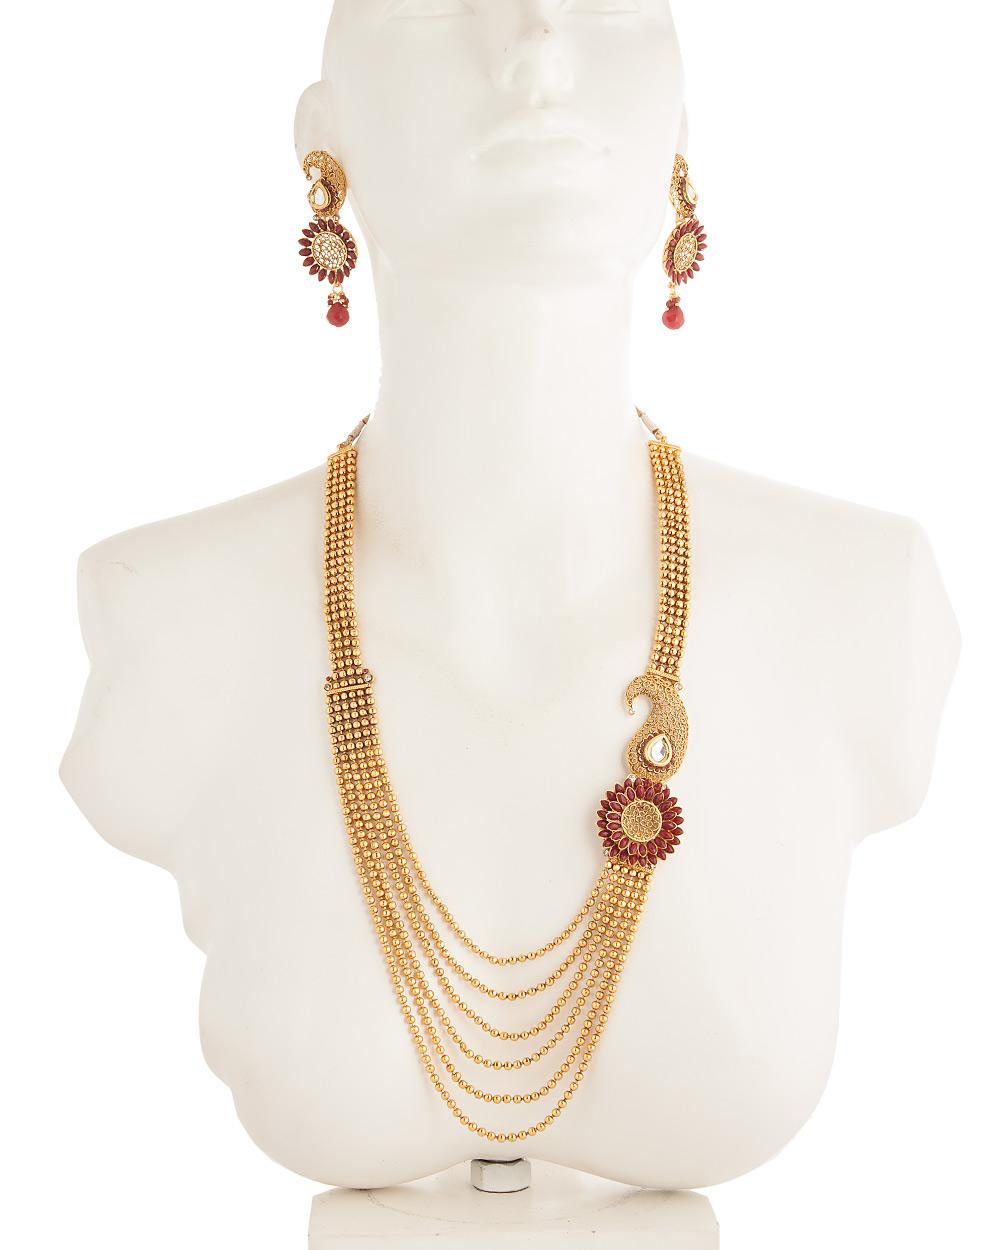 Buy necklace set with flower design one side pendant red stones necklace set with flower design one side pendant red stones mozeypictures Choice Image